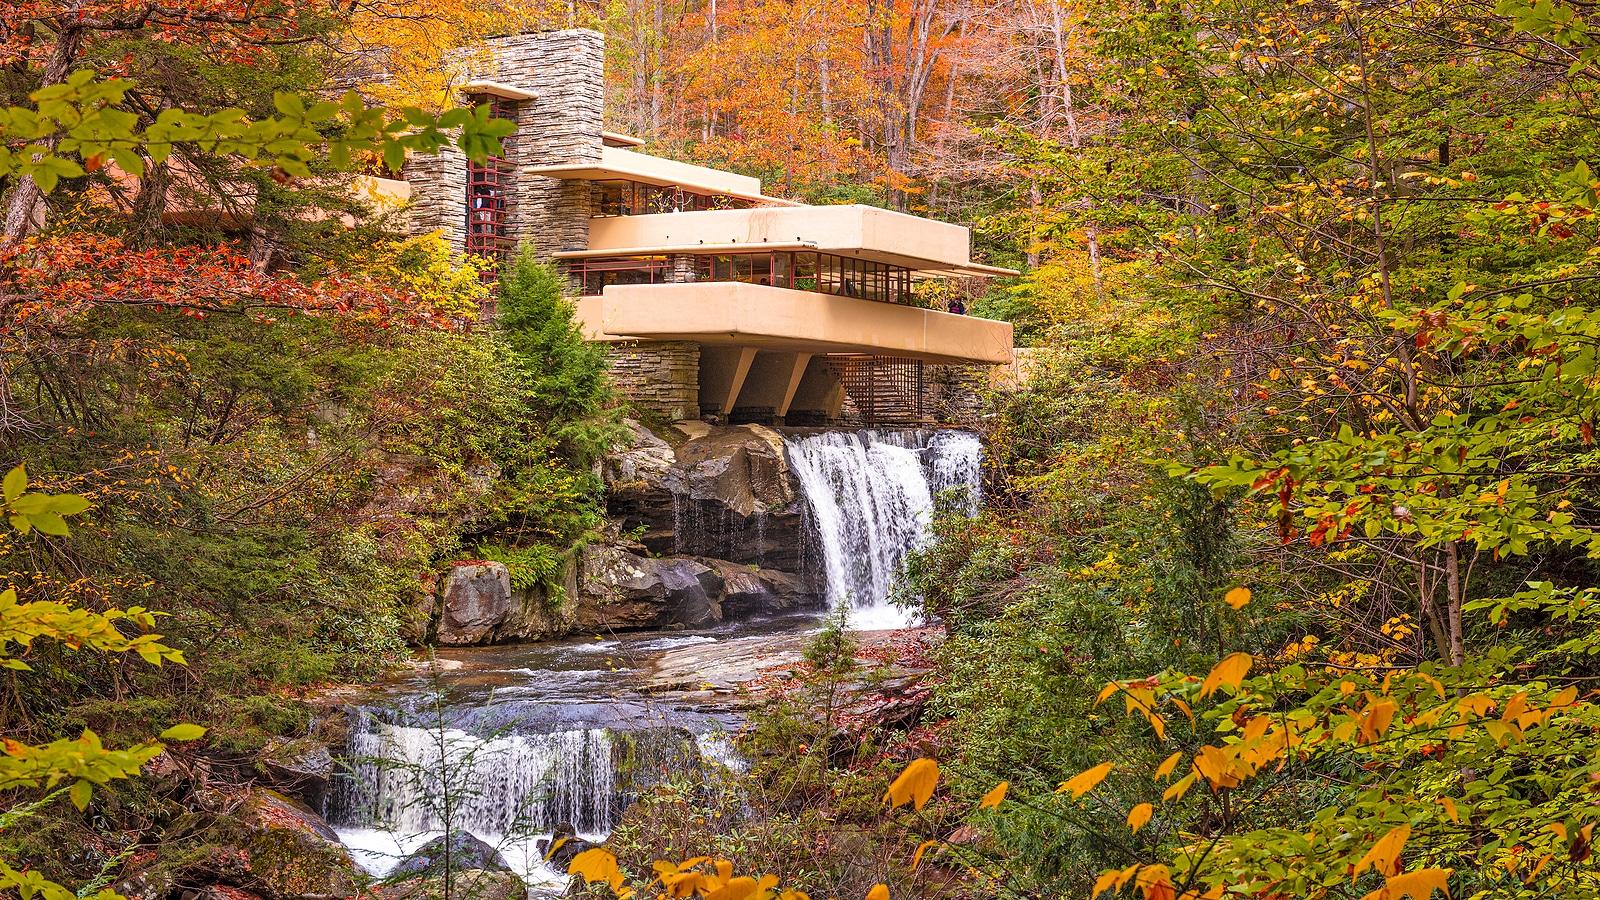 Frank Lloyd Wright Houses Near our Deep Creek Lake Hotel